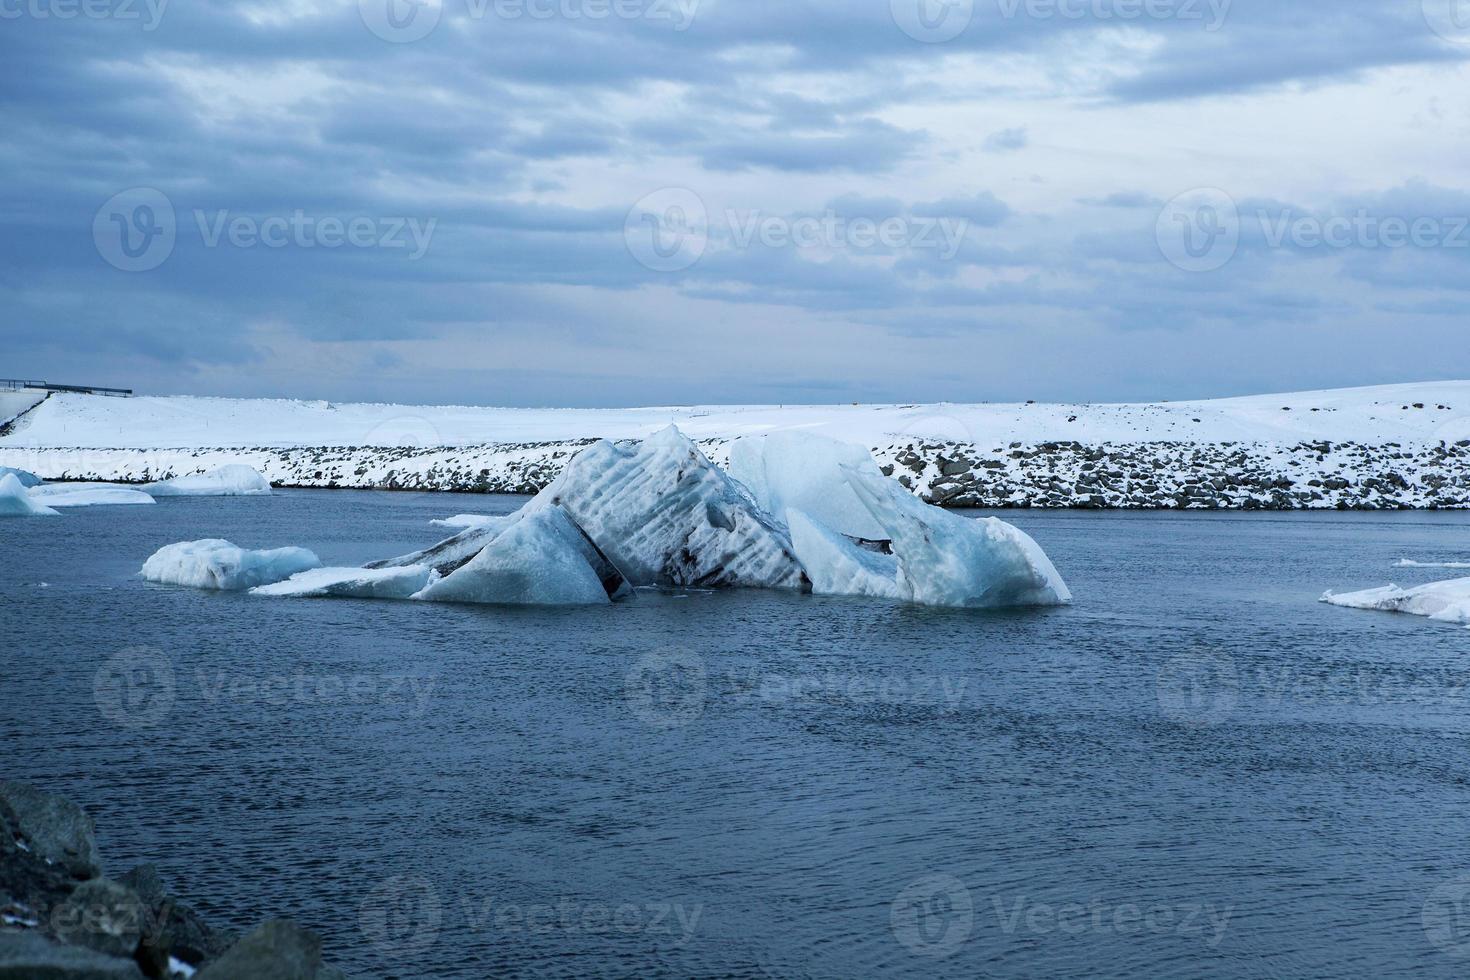 Bloques de hielo en la laguna glaciar jokulsarlon, Islandia foto